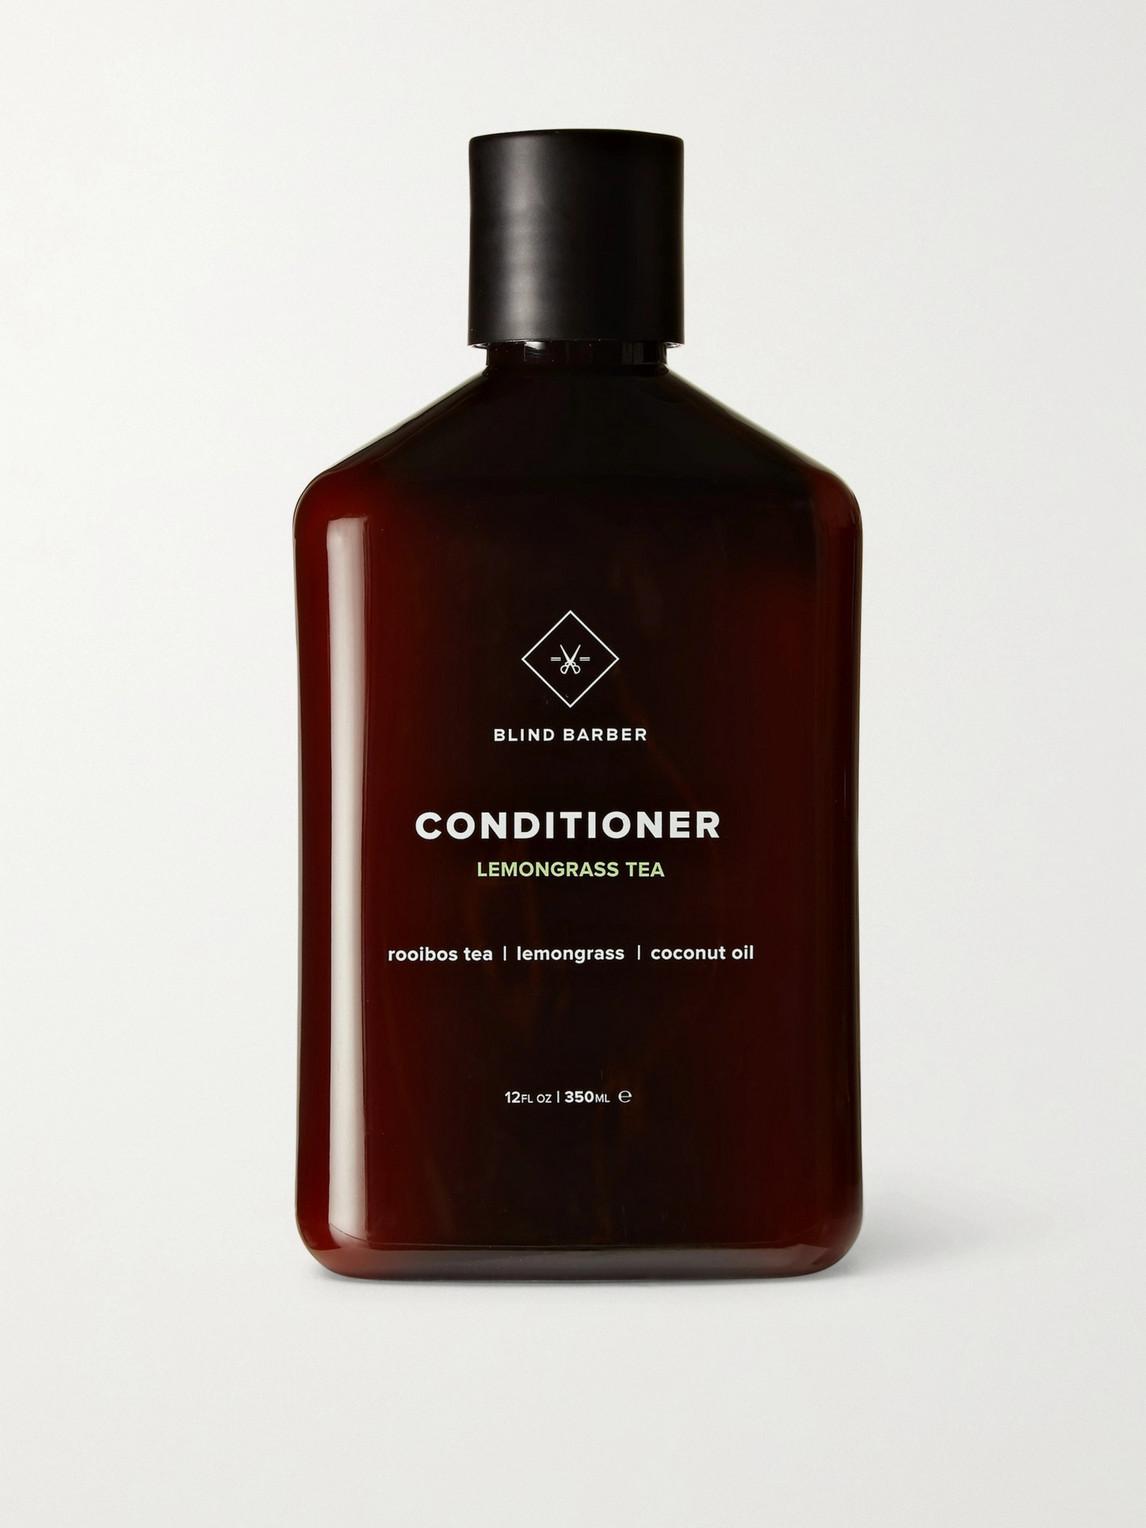 Blind Barber Lemongrass Tea Conditioner, 350ml In Colorless